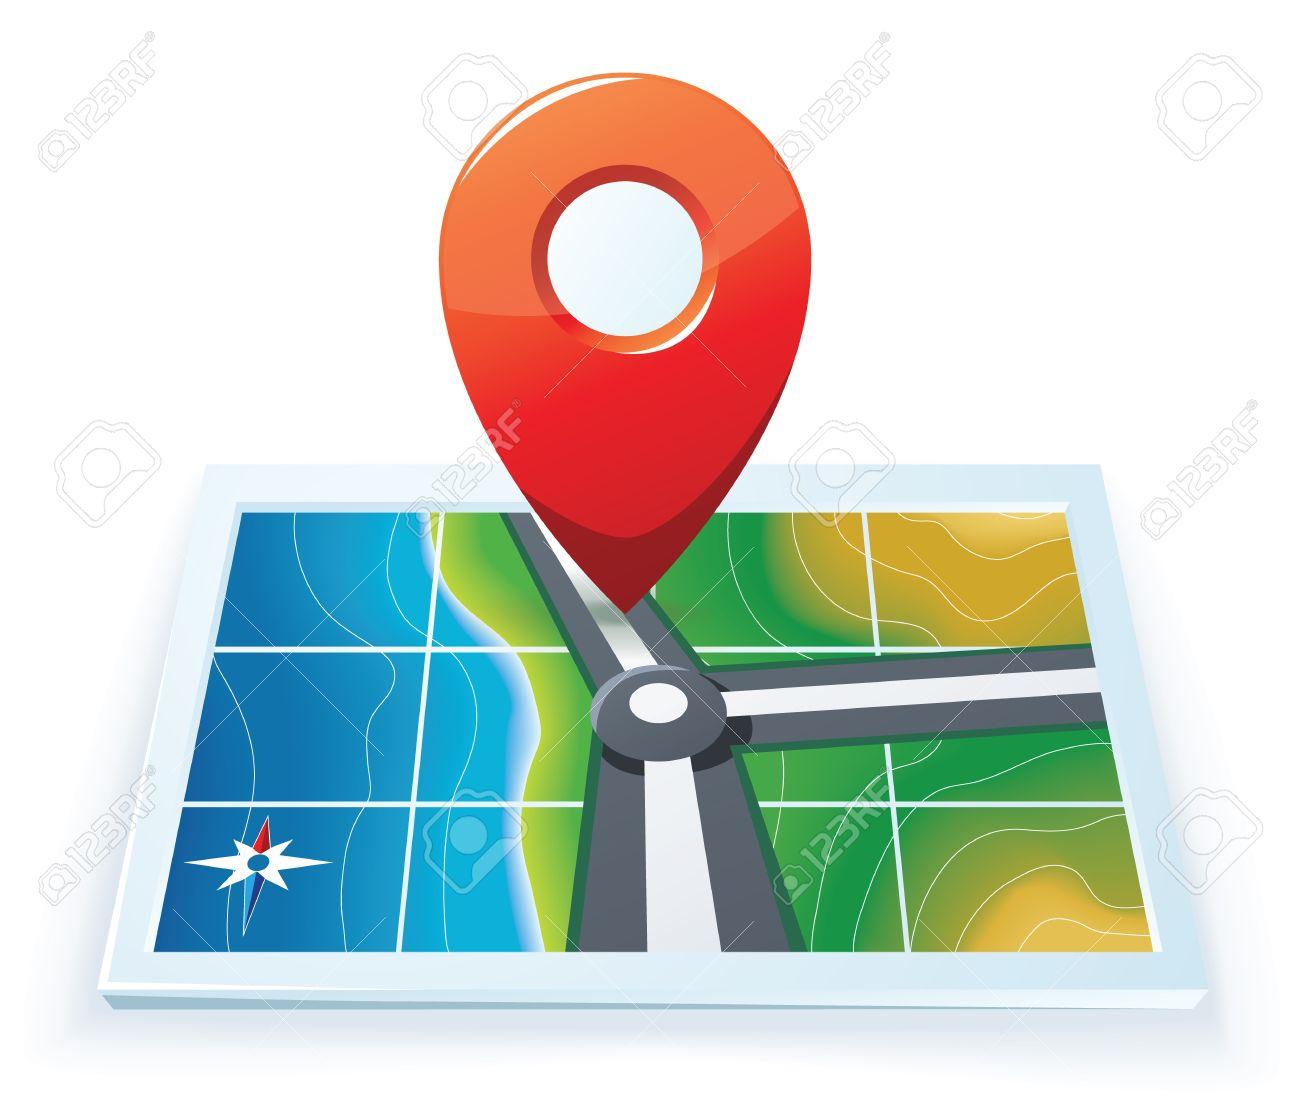 Modern gps map icon - 14965687